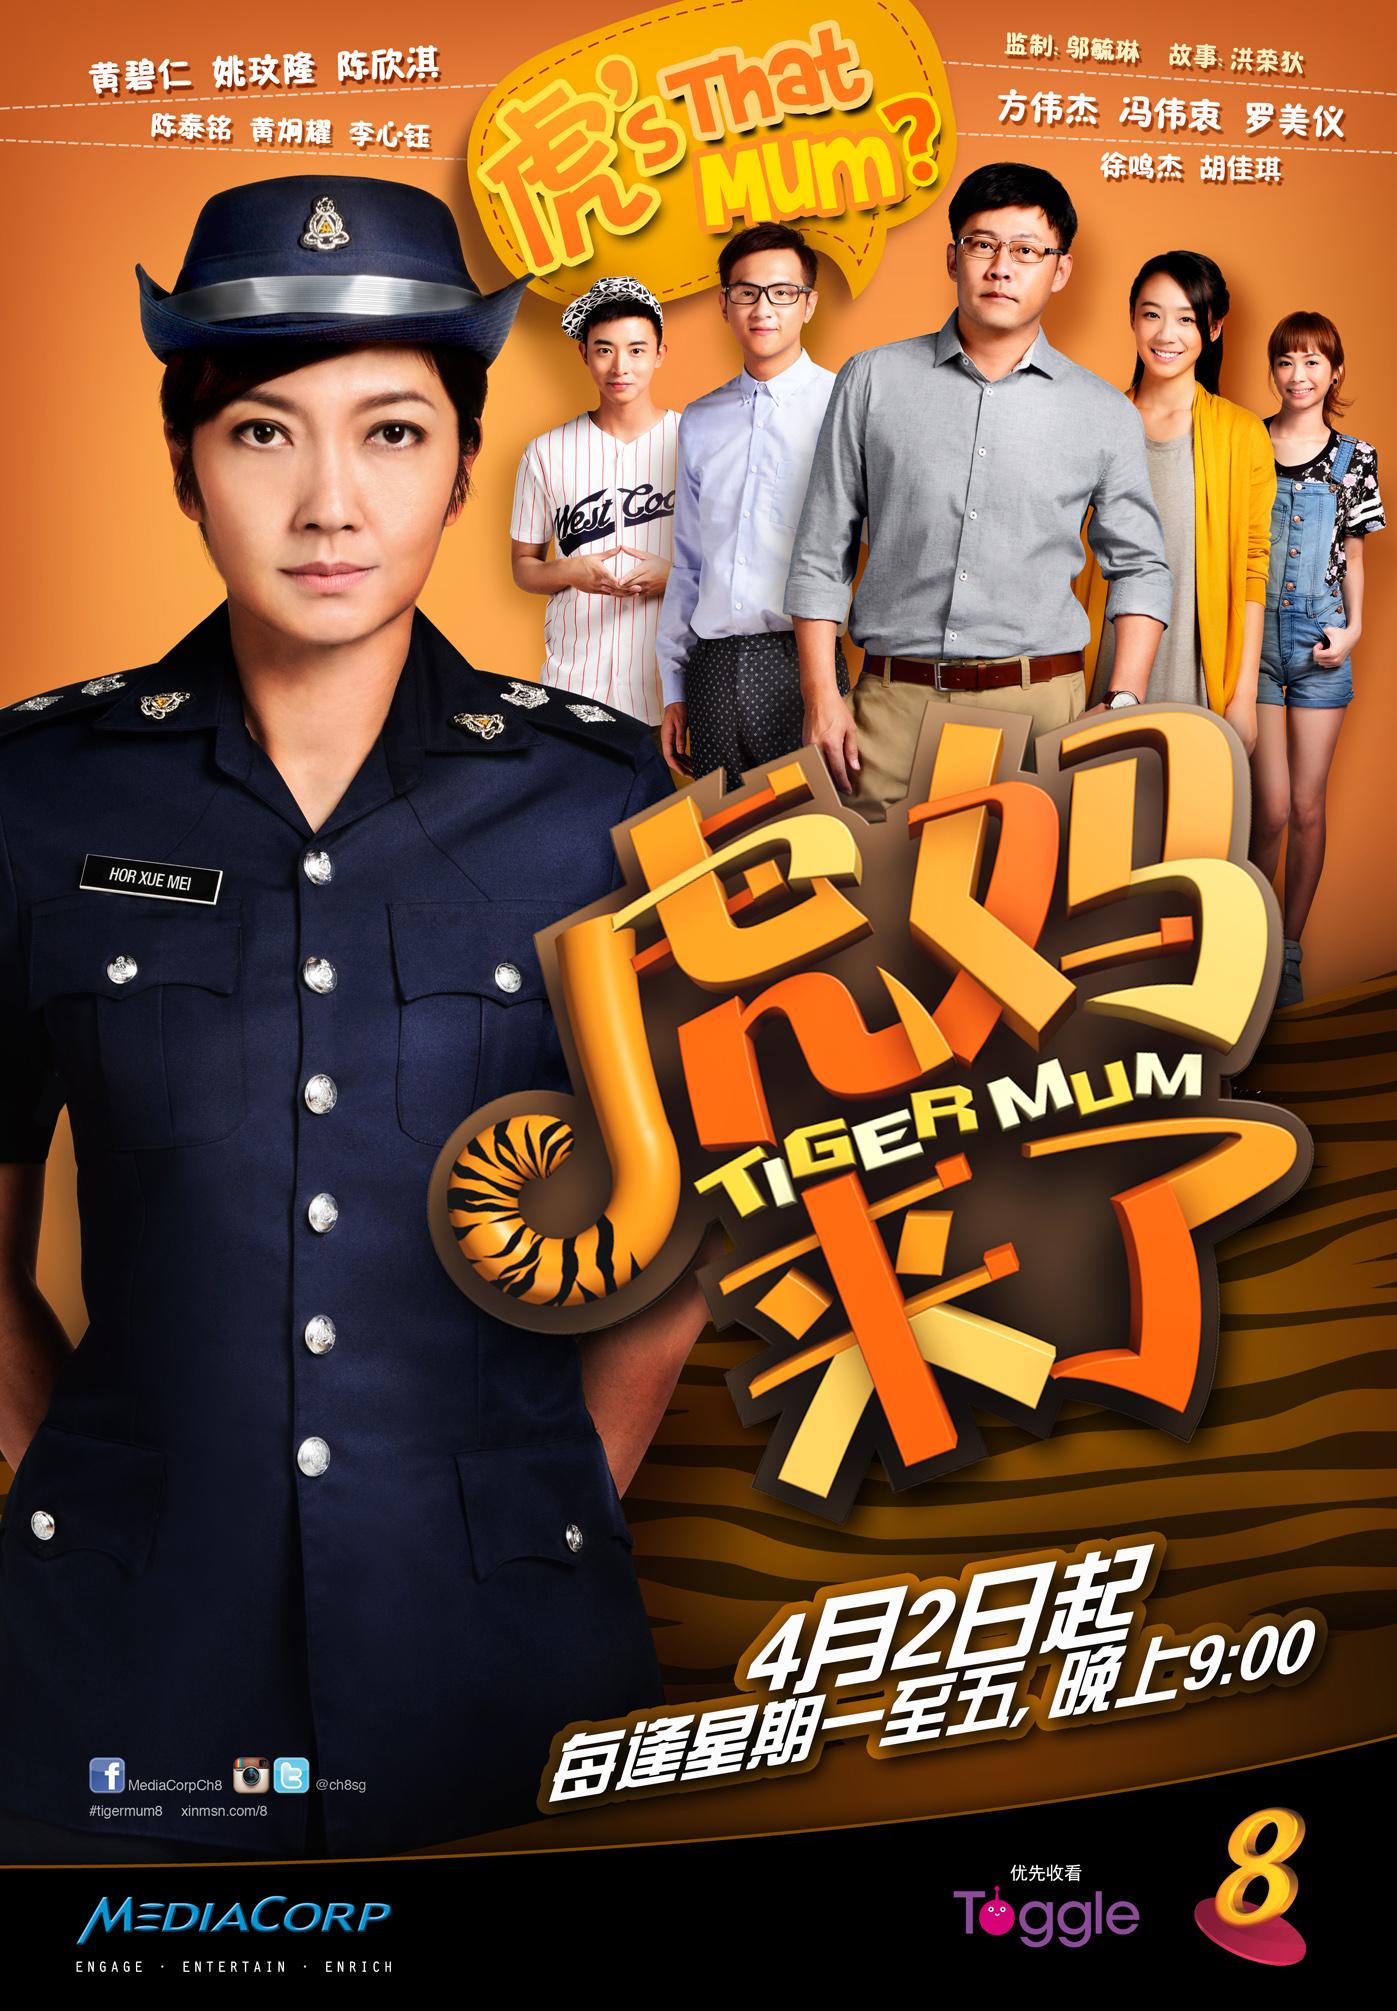 tiger mum singapore tv